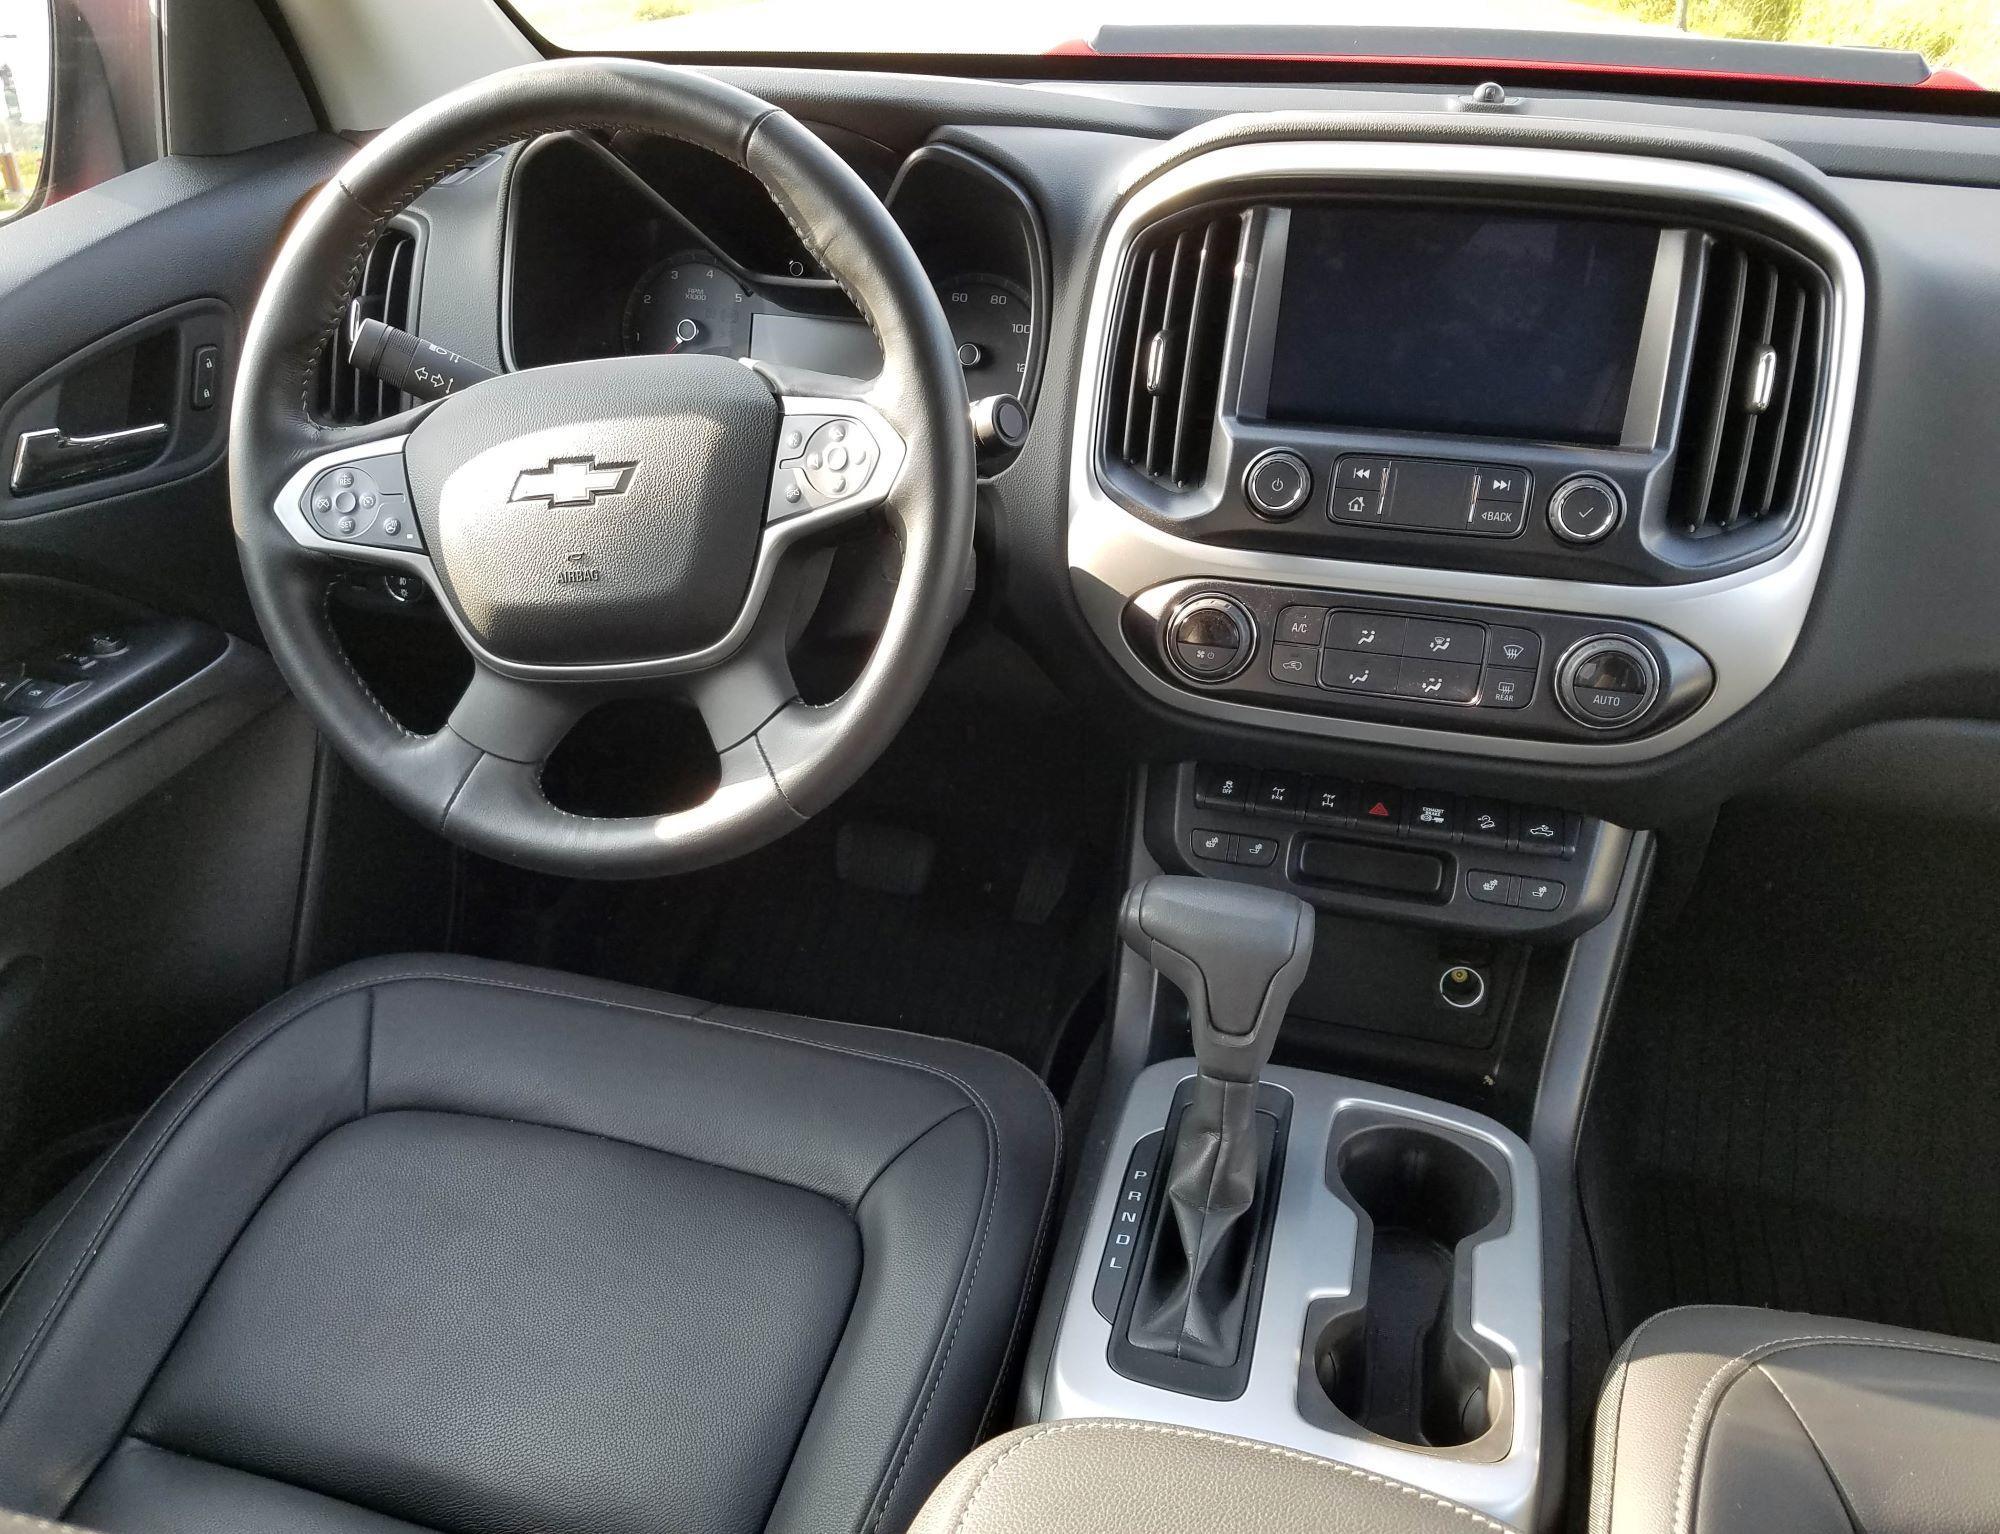 2019 Chevrolet Colorado 4wd Zr2 Crew Short Box Bison Review Wuwm